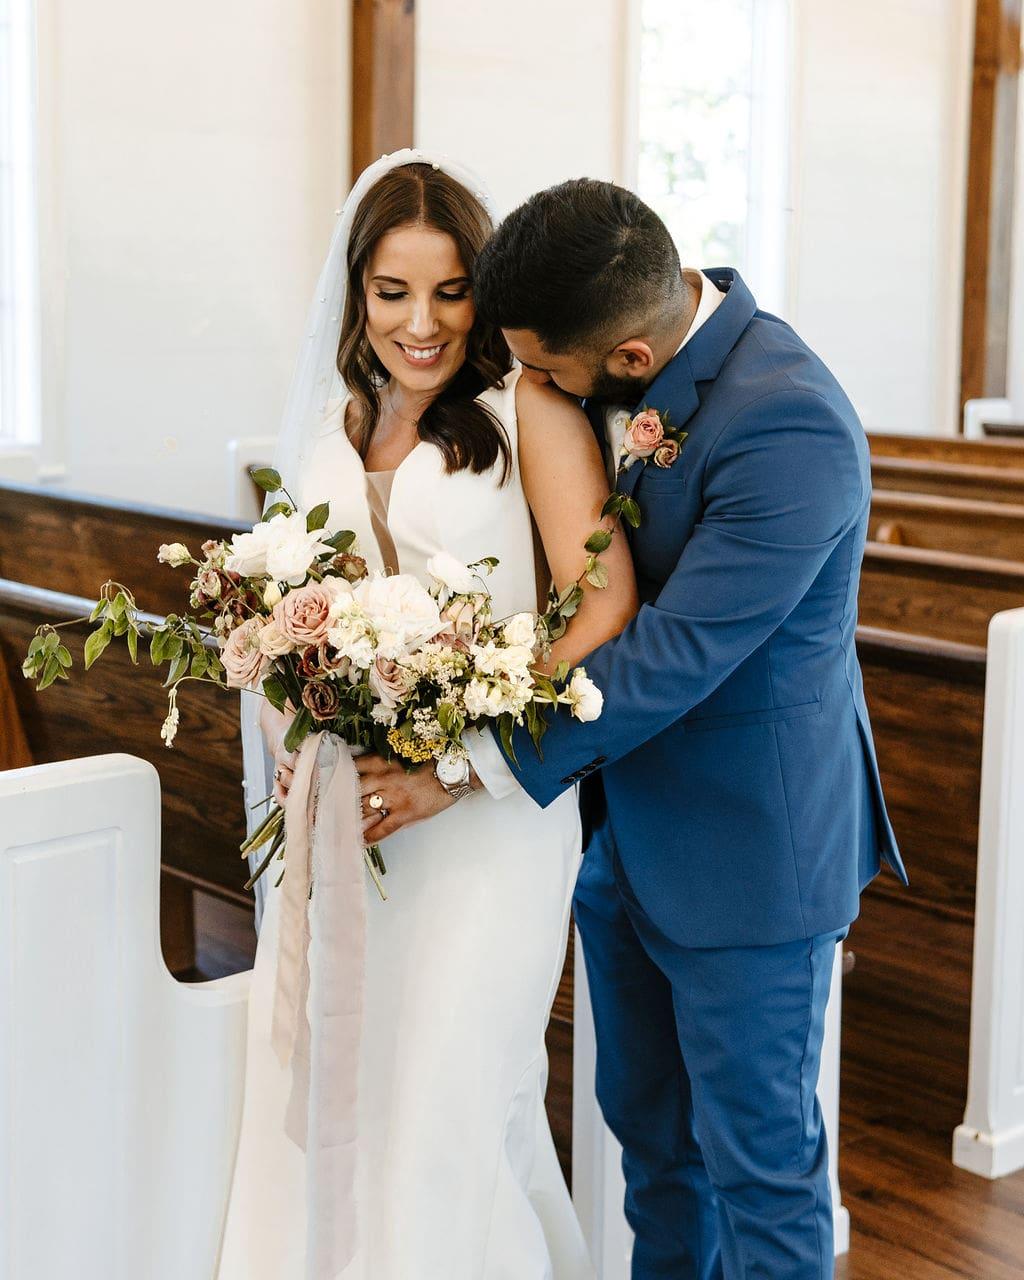 Organic Bouquet, Chapel Wedding, Chattanooga Wedding Florist, Chattanooga Wedding Coordinator, Lang Floral Designs